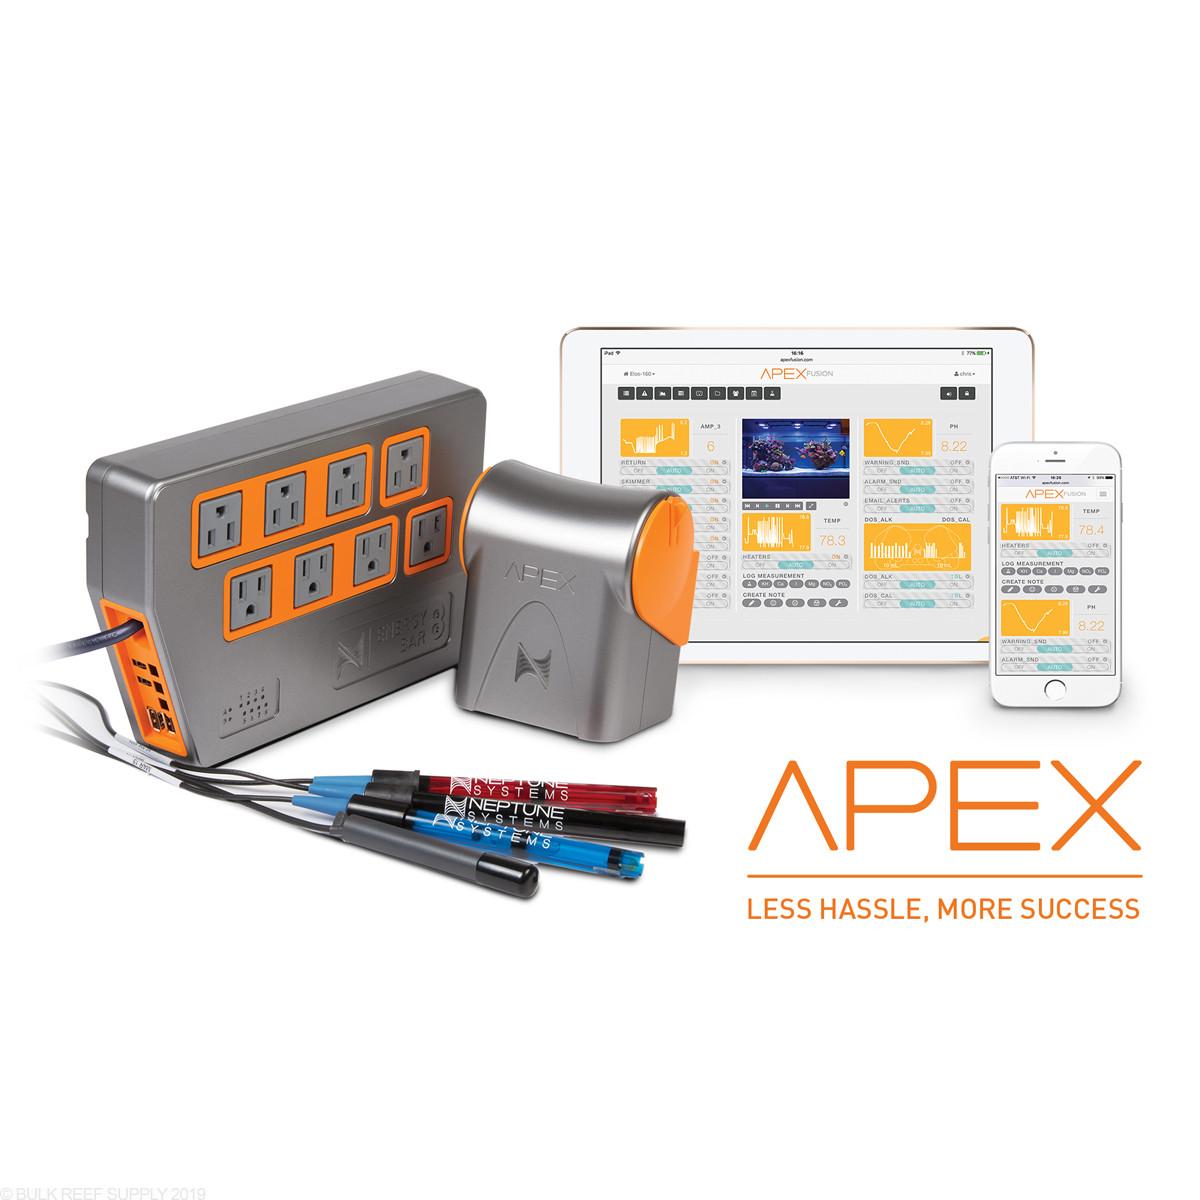 neptune apex wiring diagram wiring diagram description Neptune Apex Mounting Board apex controller system (open box) neptune systems bulk reef supply neptune apex mounting neptune apex wiring diagram